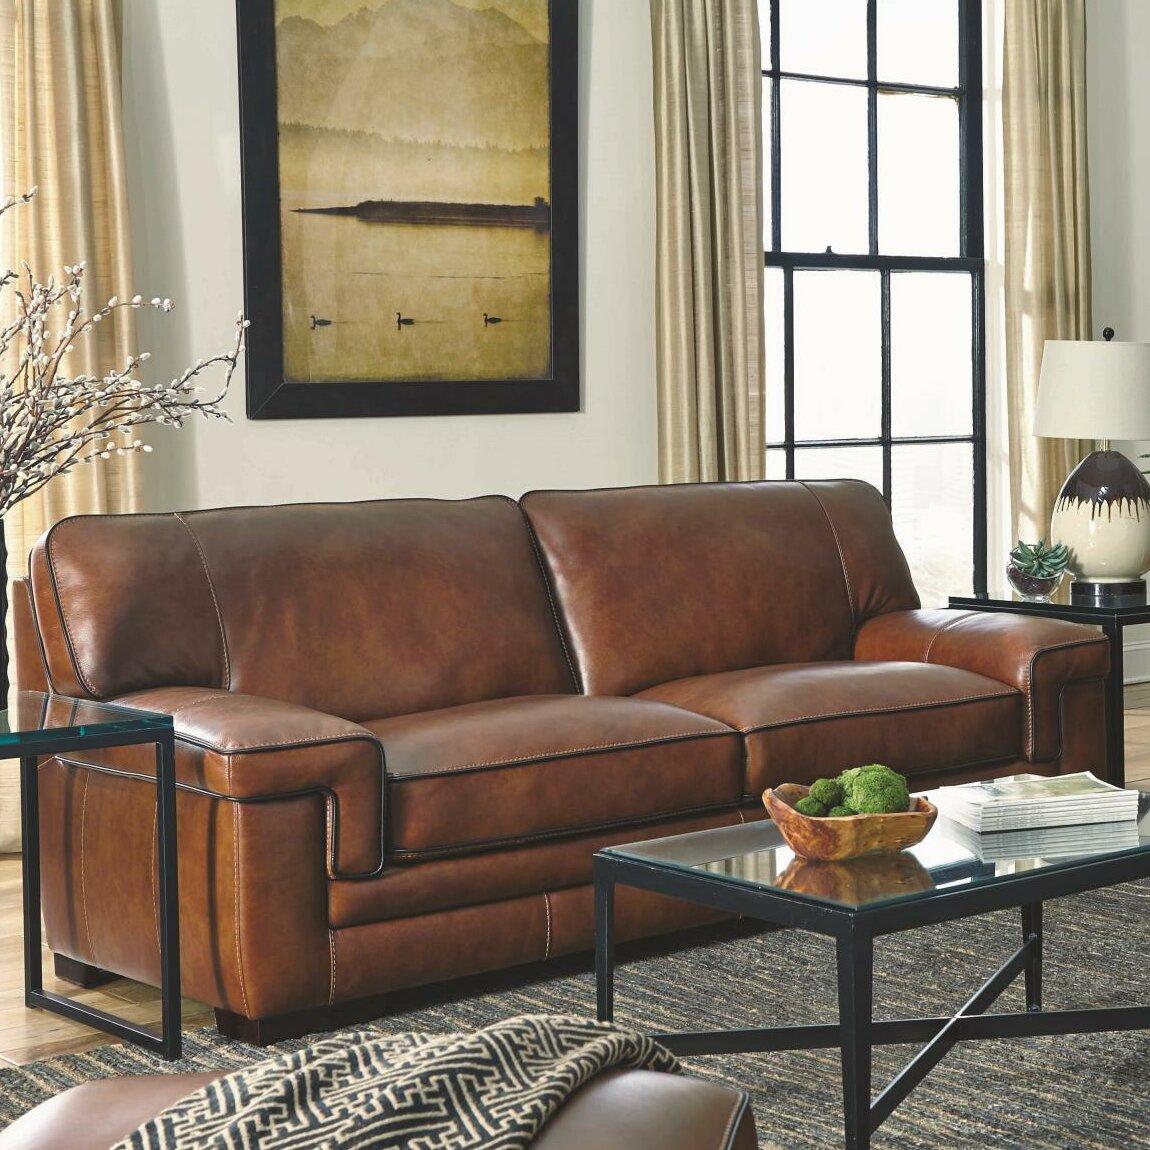 Reviews For Leather Sofas: Simon Li Macco Leather Sofa & Reviews